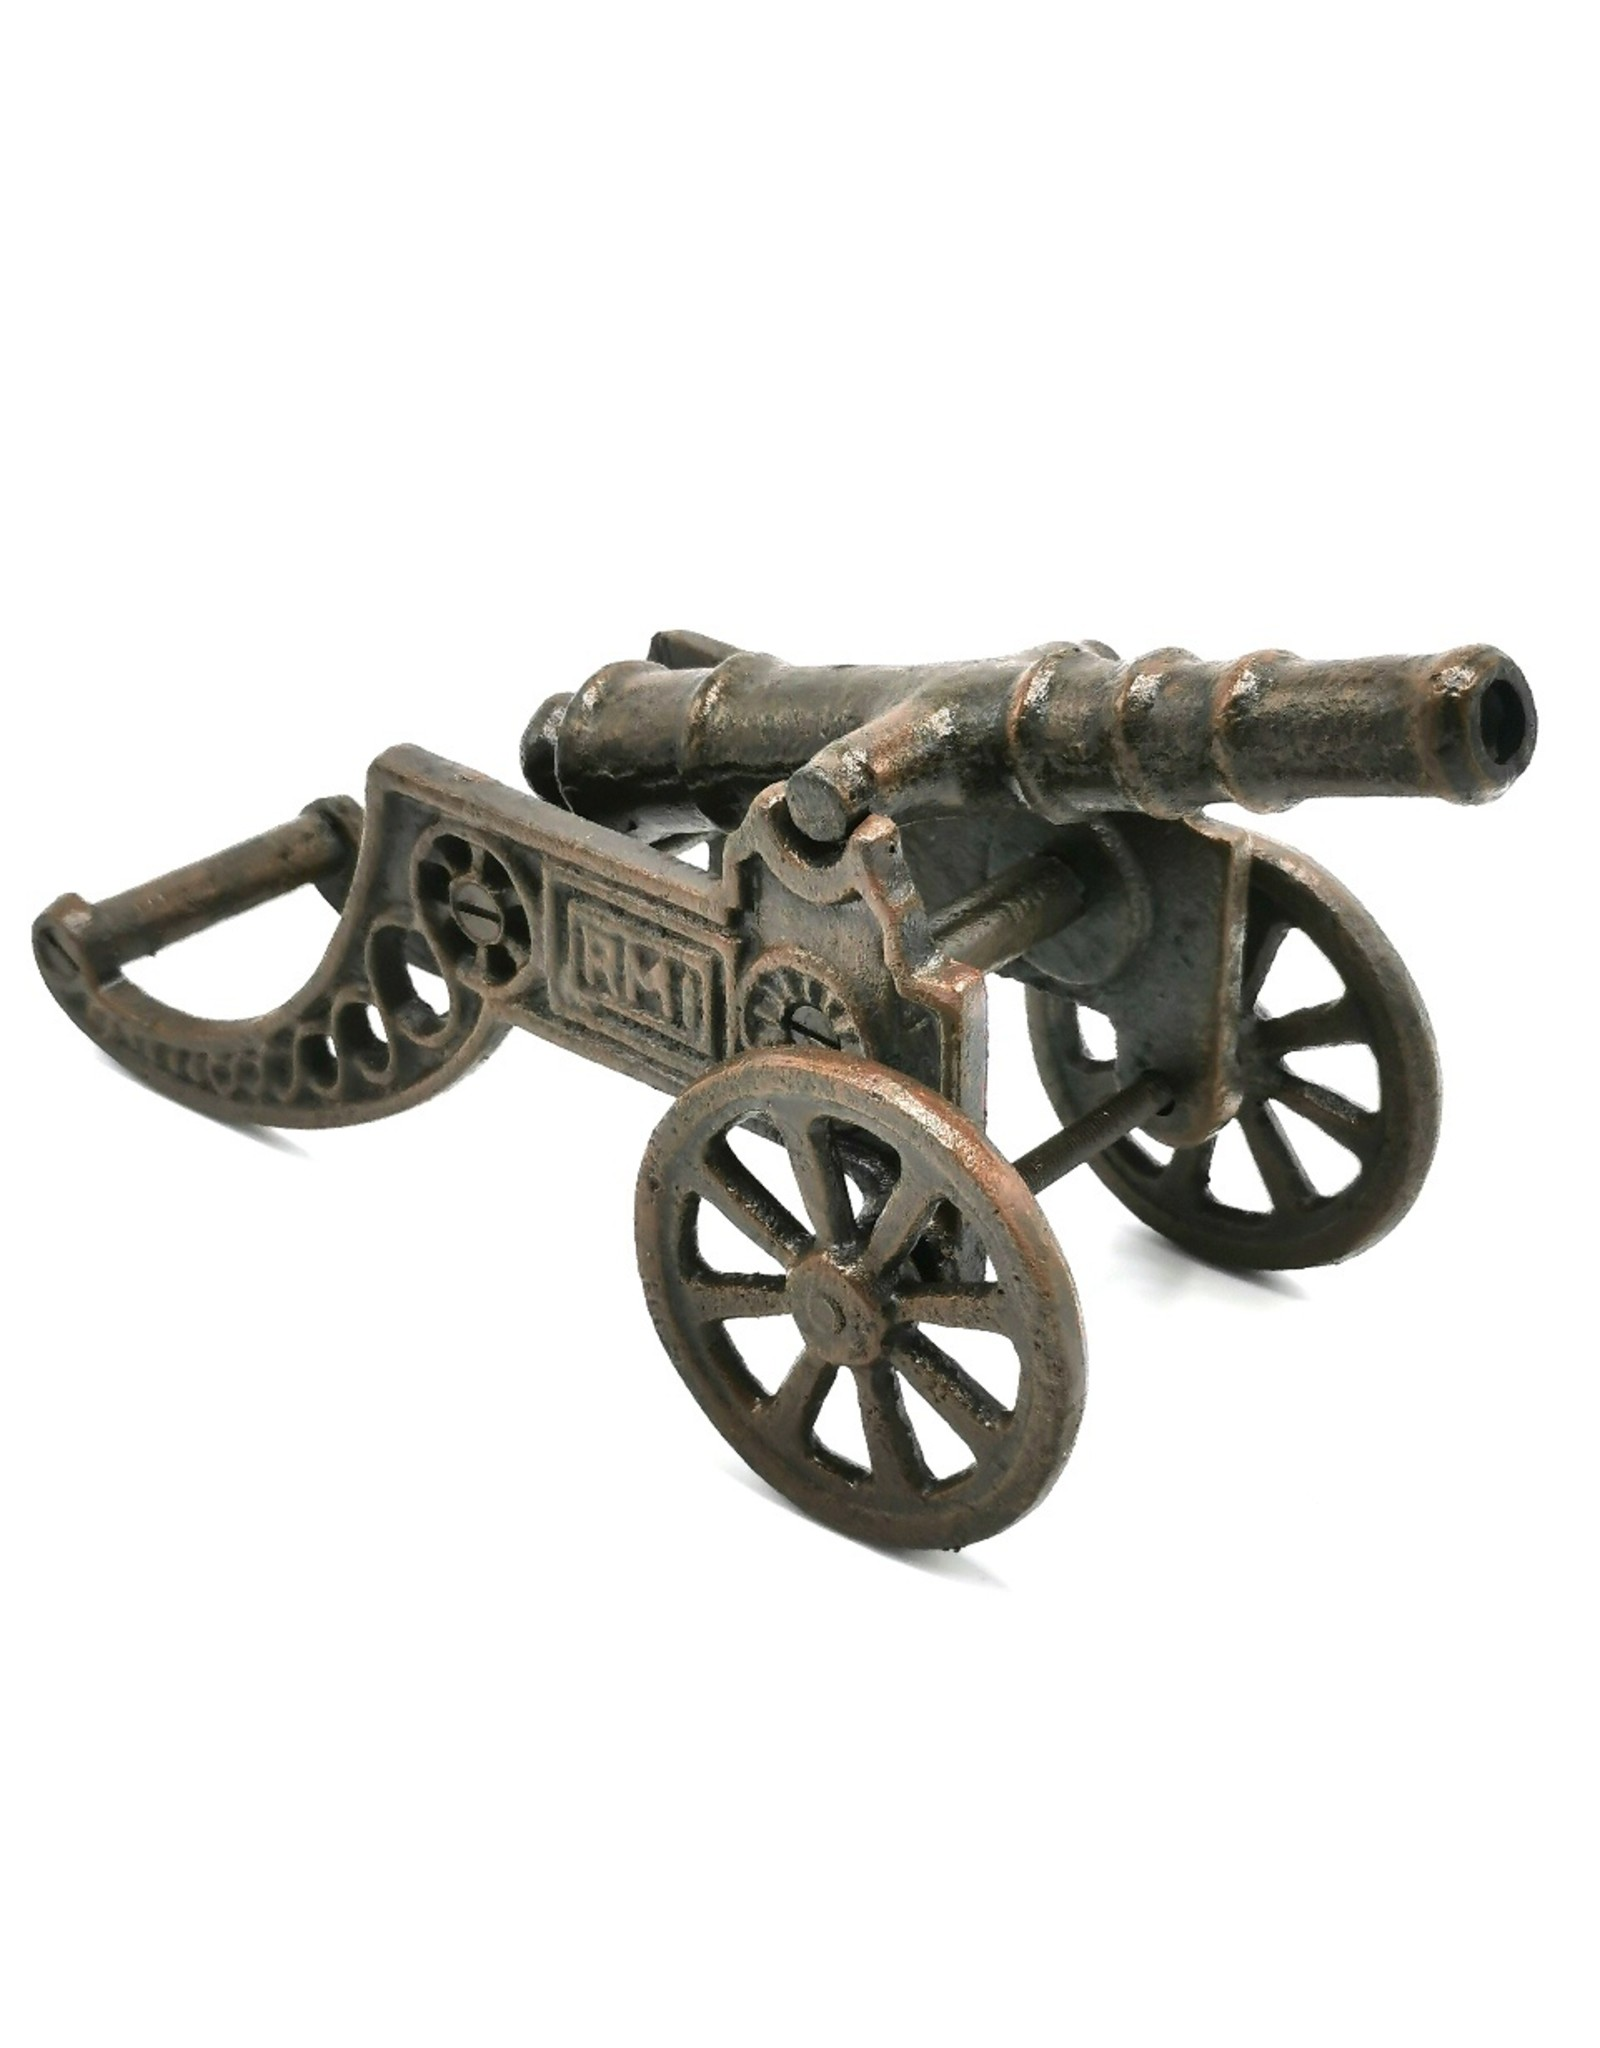 Trukado Miscellaneous - Cast iron canon miniature